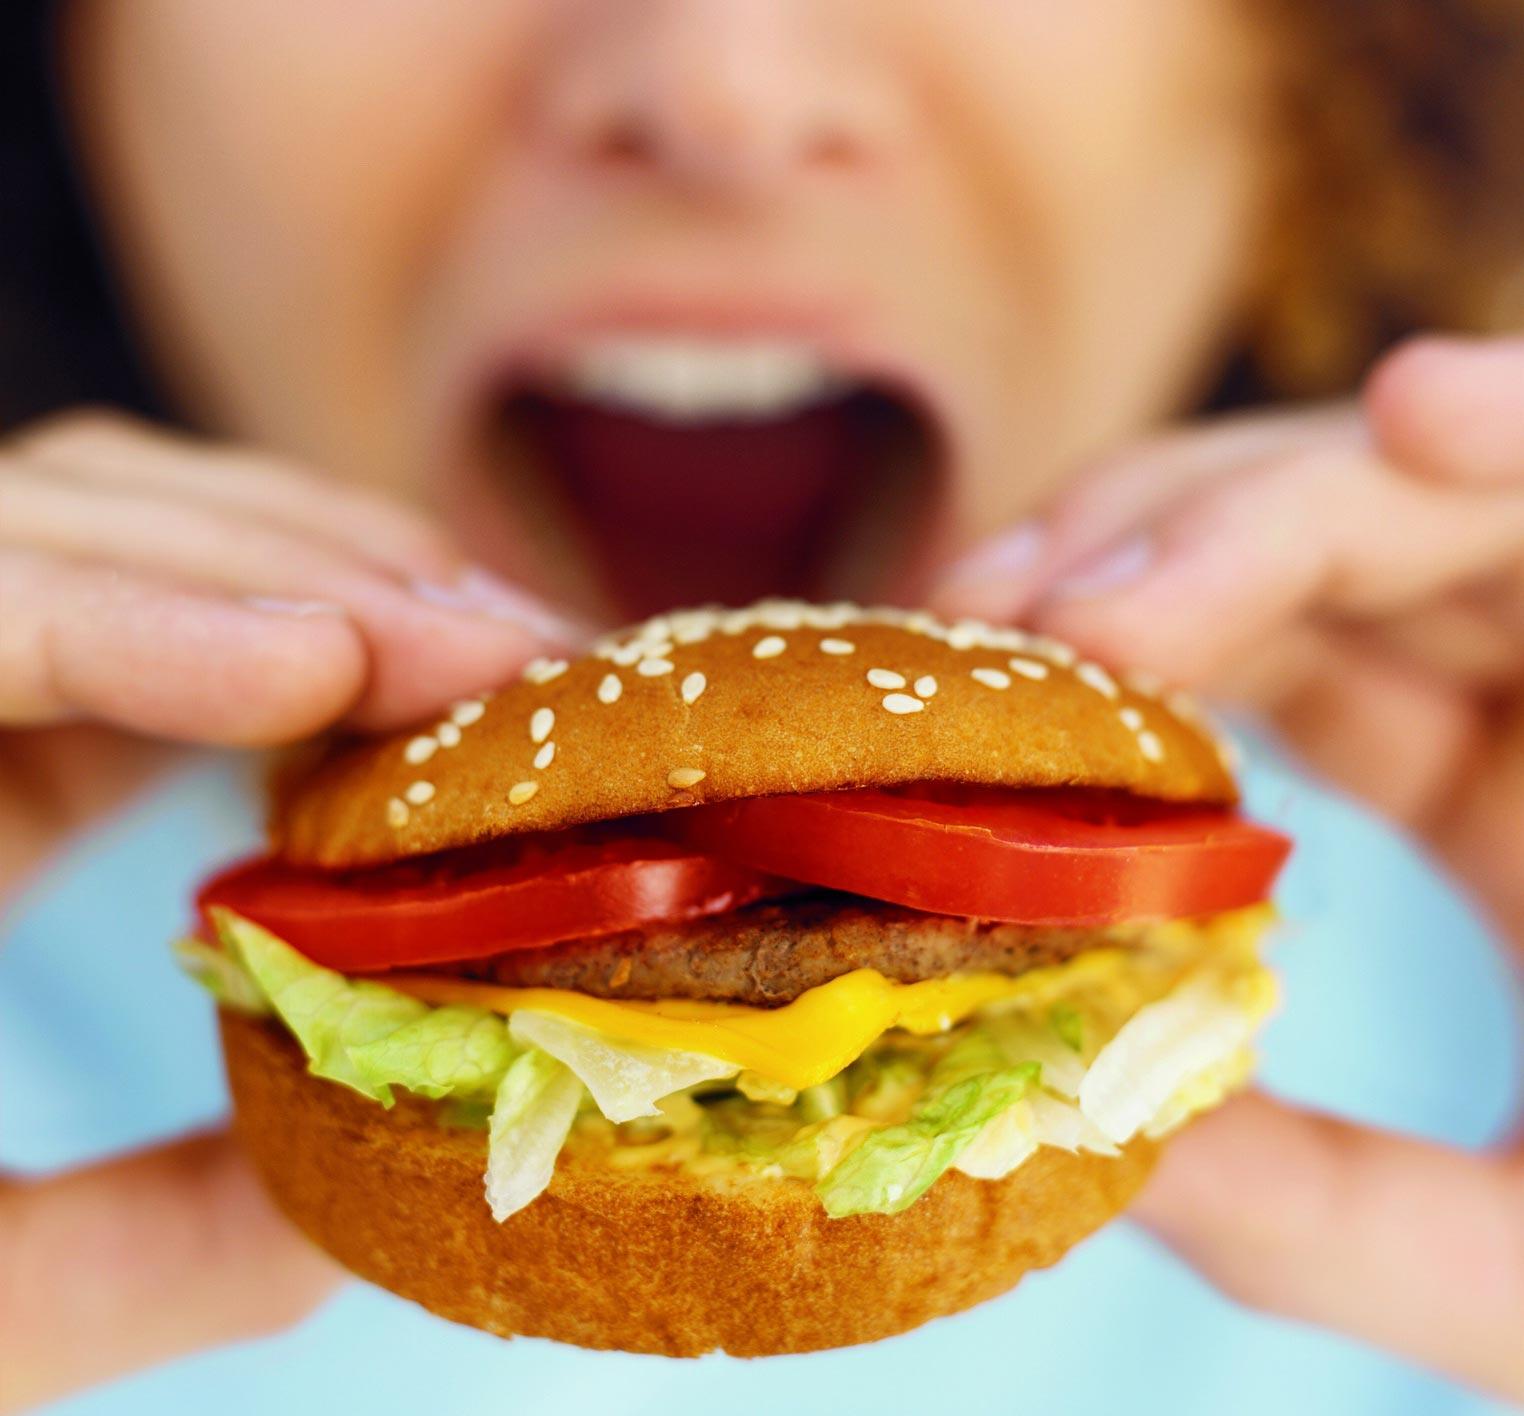 Valgote daug greito maisto